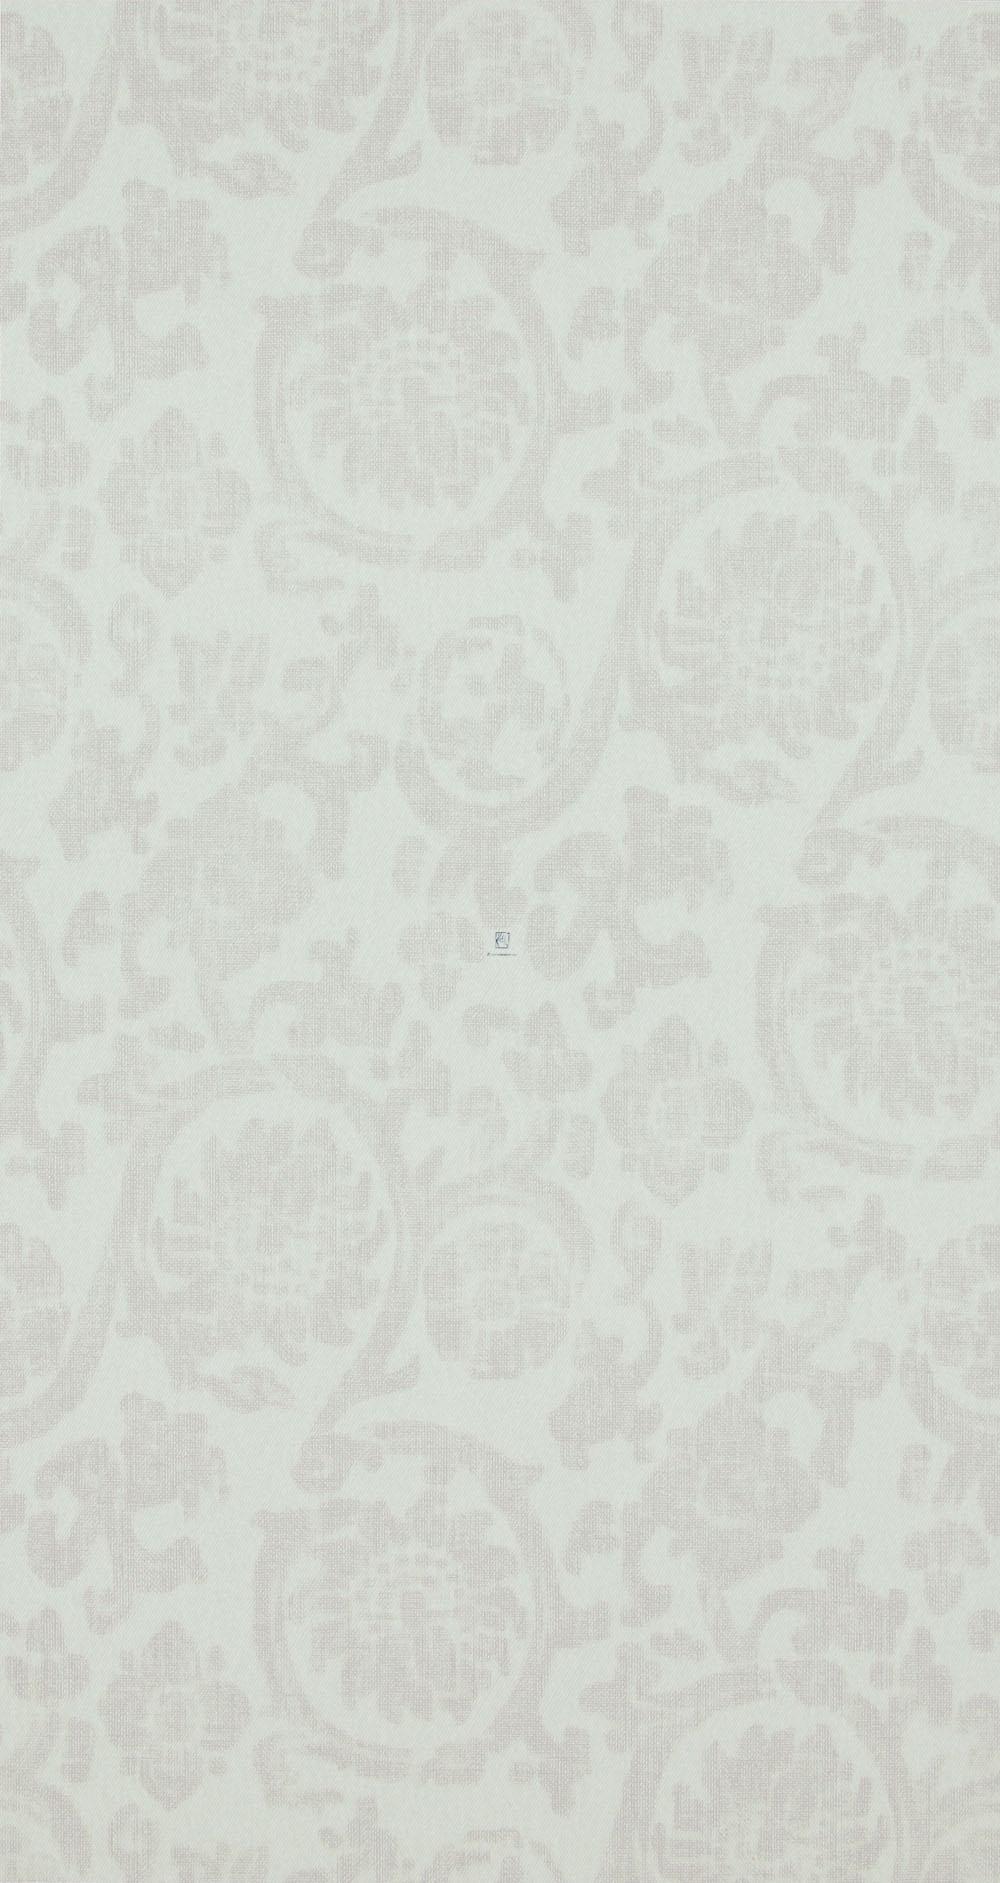 Bn wallcoverings denim 17600 behang - Fries behang wall ...